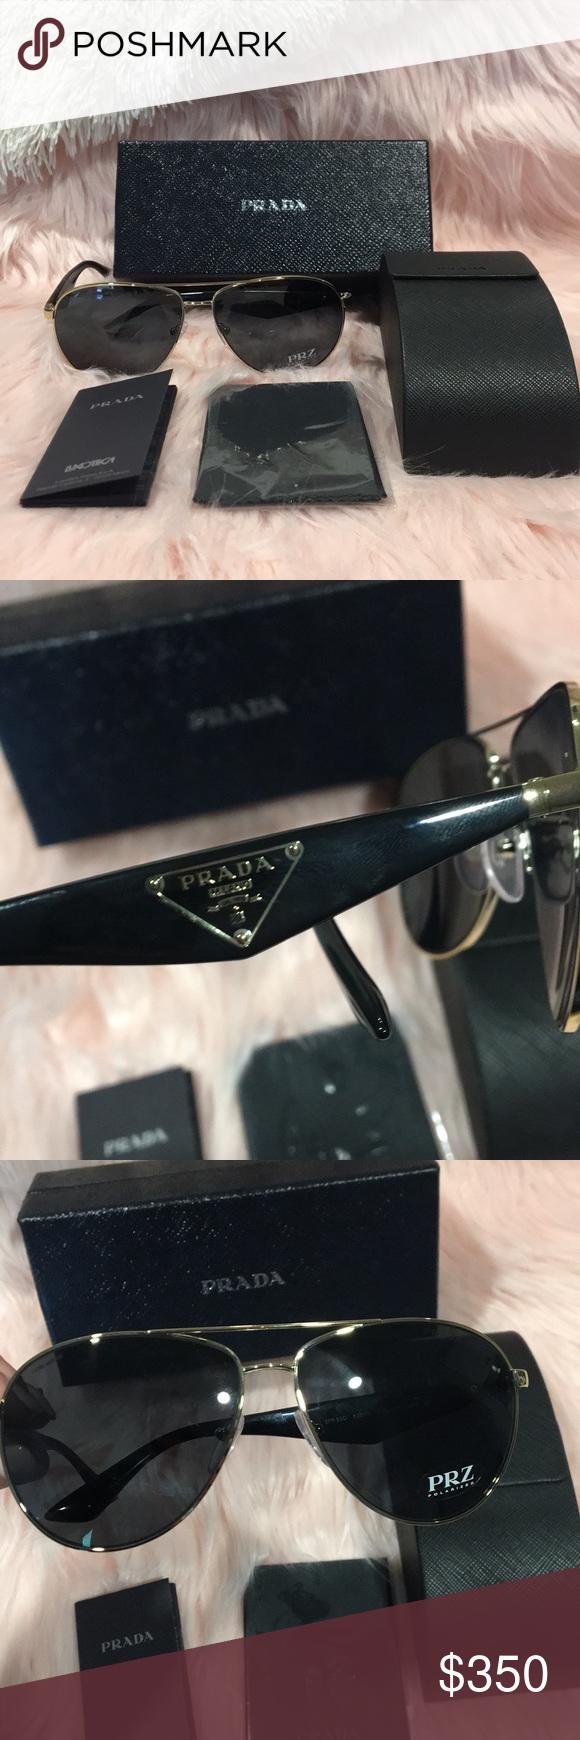 2248af0f664 NIB - Prada - Milano Triangle Aviator Sunglasses NIB - Prada - Milano  Triangle Aviator Sunglasses